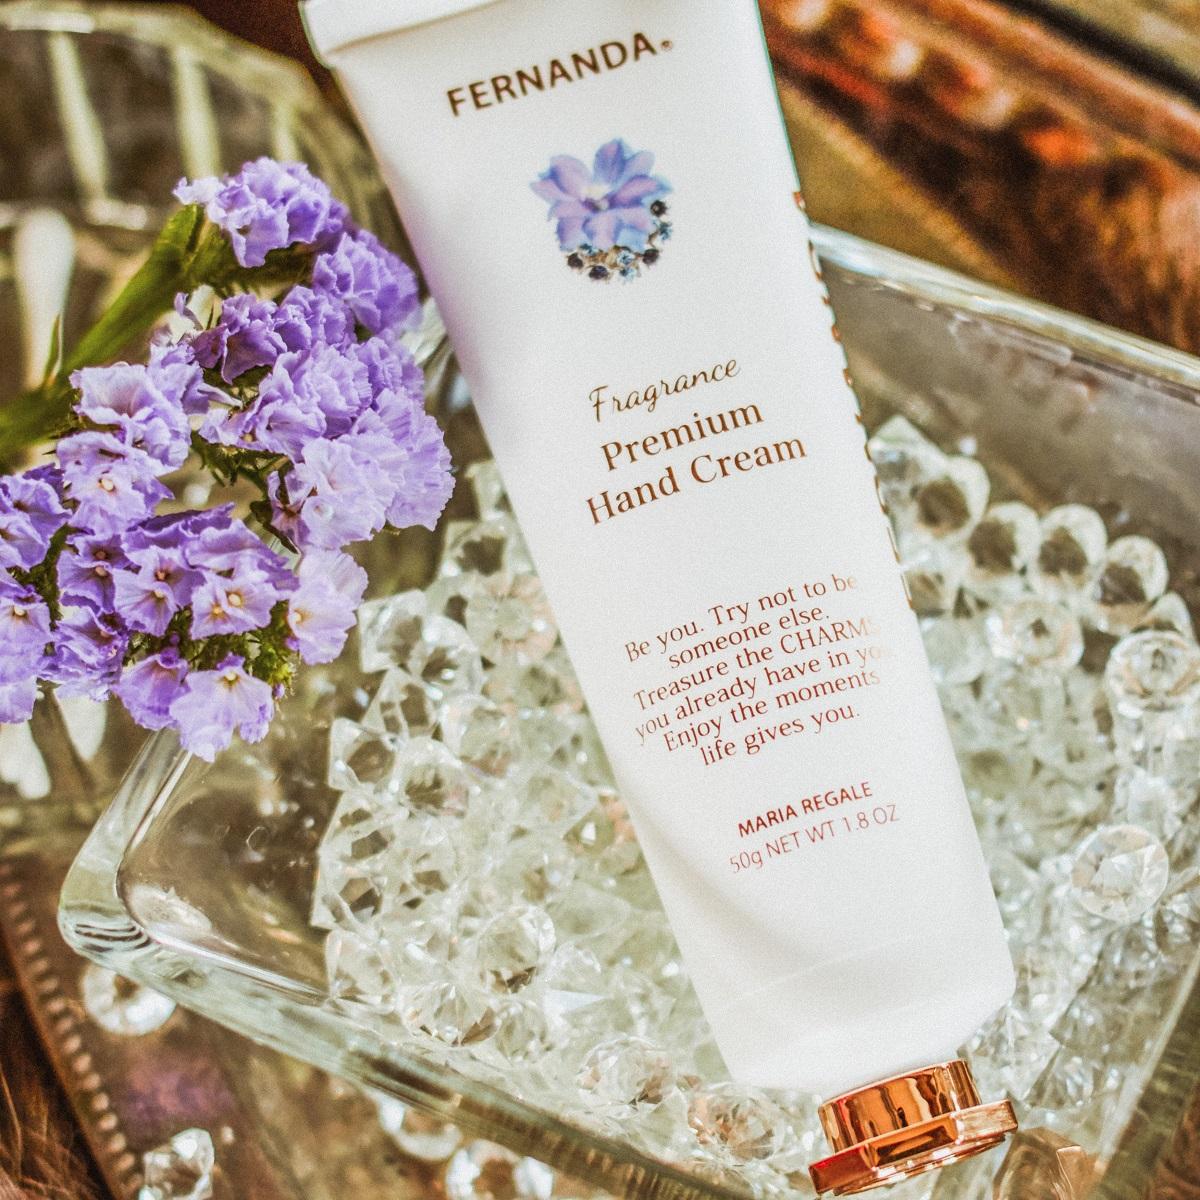 Fragrance Premium Hand Cream (Maria Regale)/フレグランスプレミアムハンドクリーム(マリアリゲル)